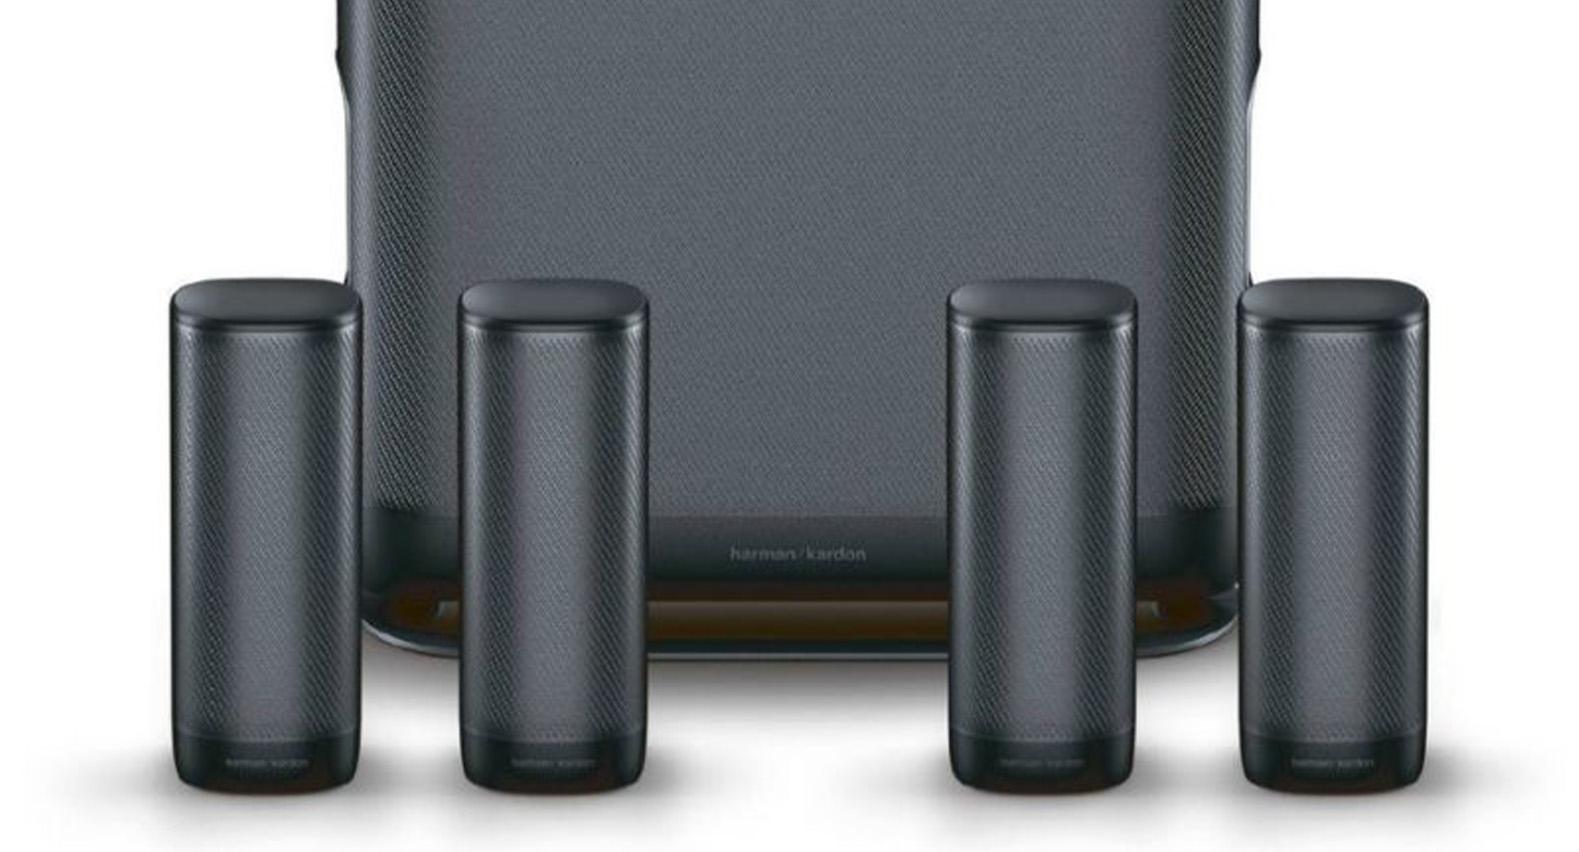 HarmanKardon Surround Wireless 5.1 Home Theater System Black